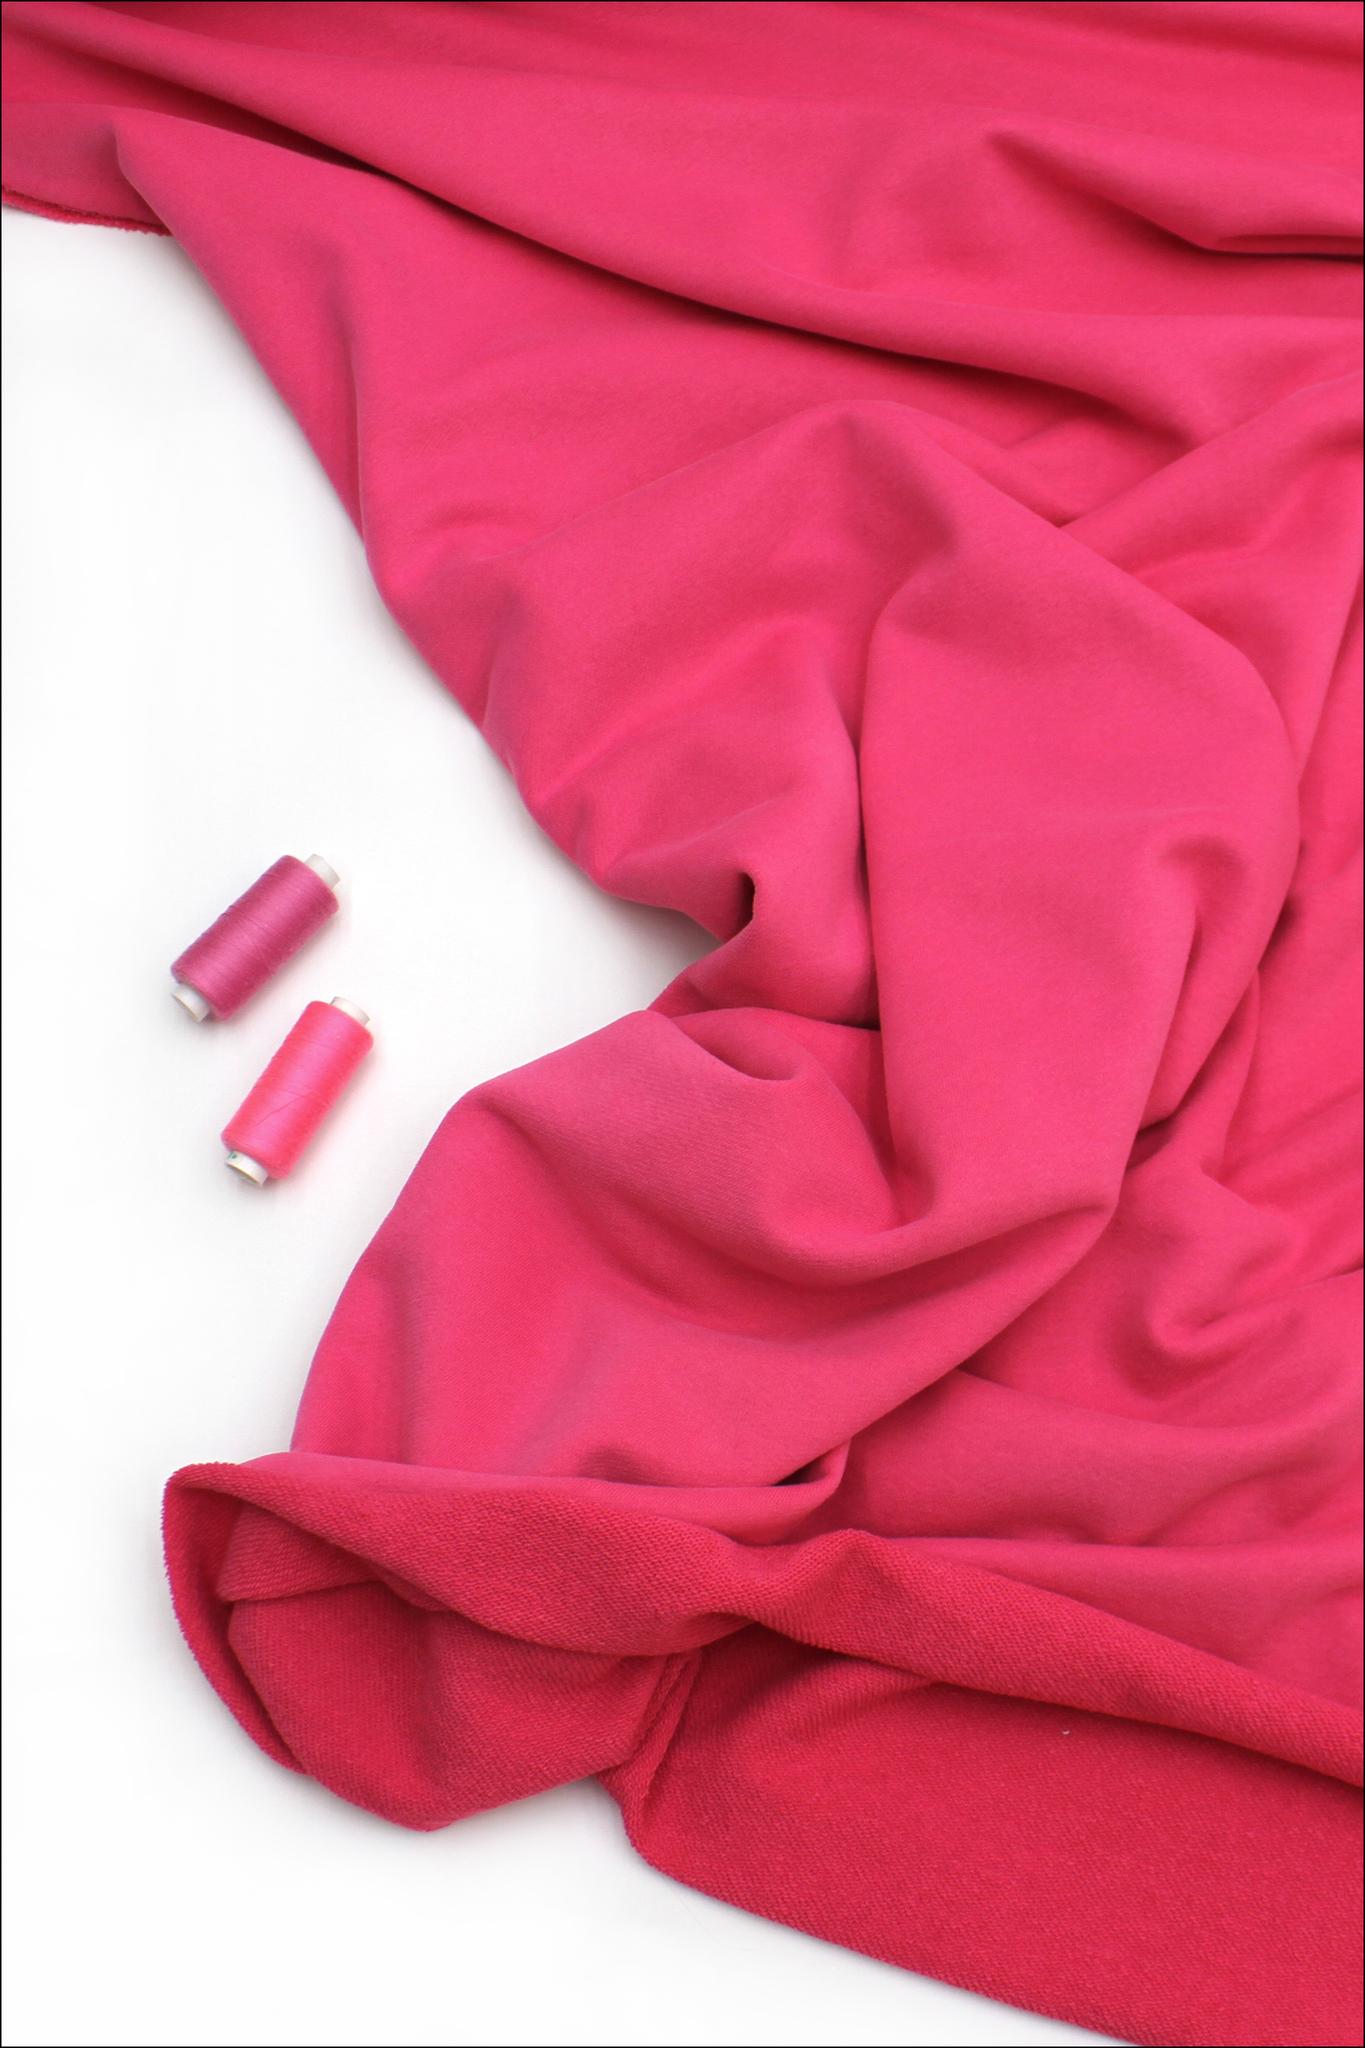 Футер 3х нитка петля, ярко-розовый, велюр-эффект, 330 гр